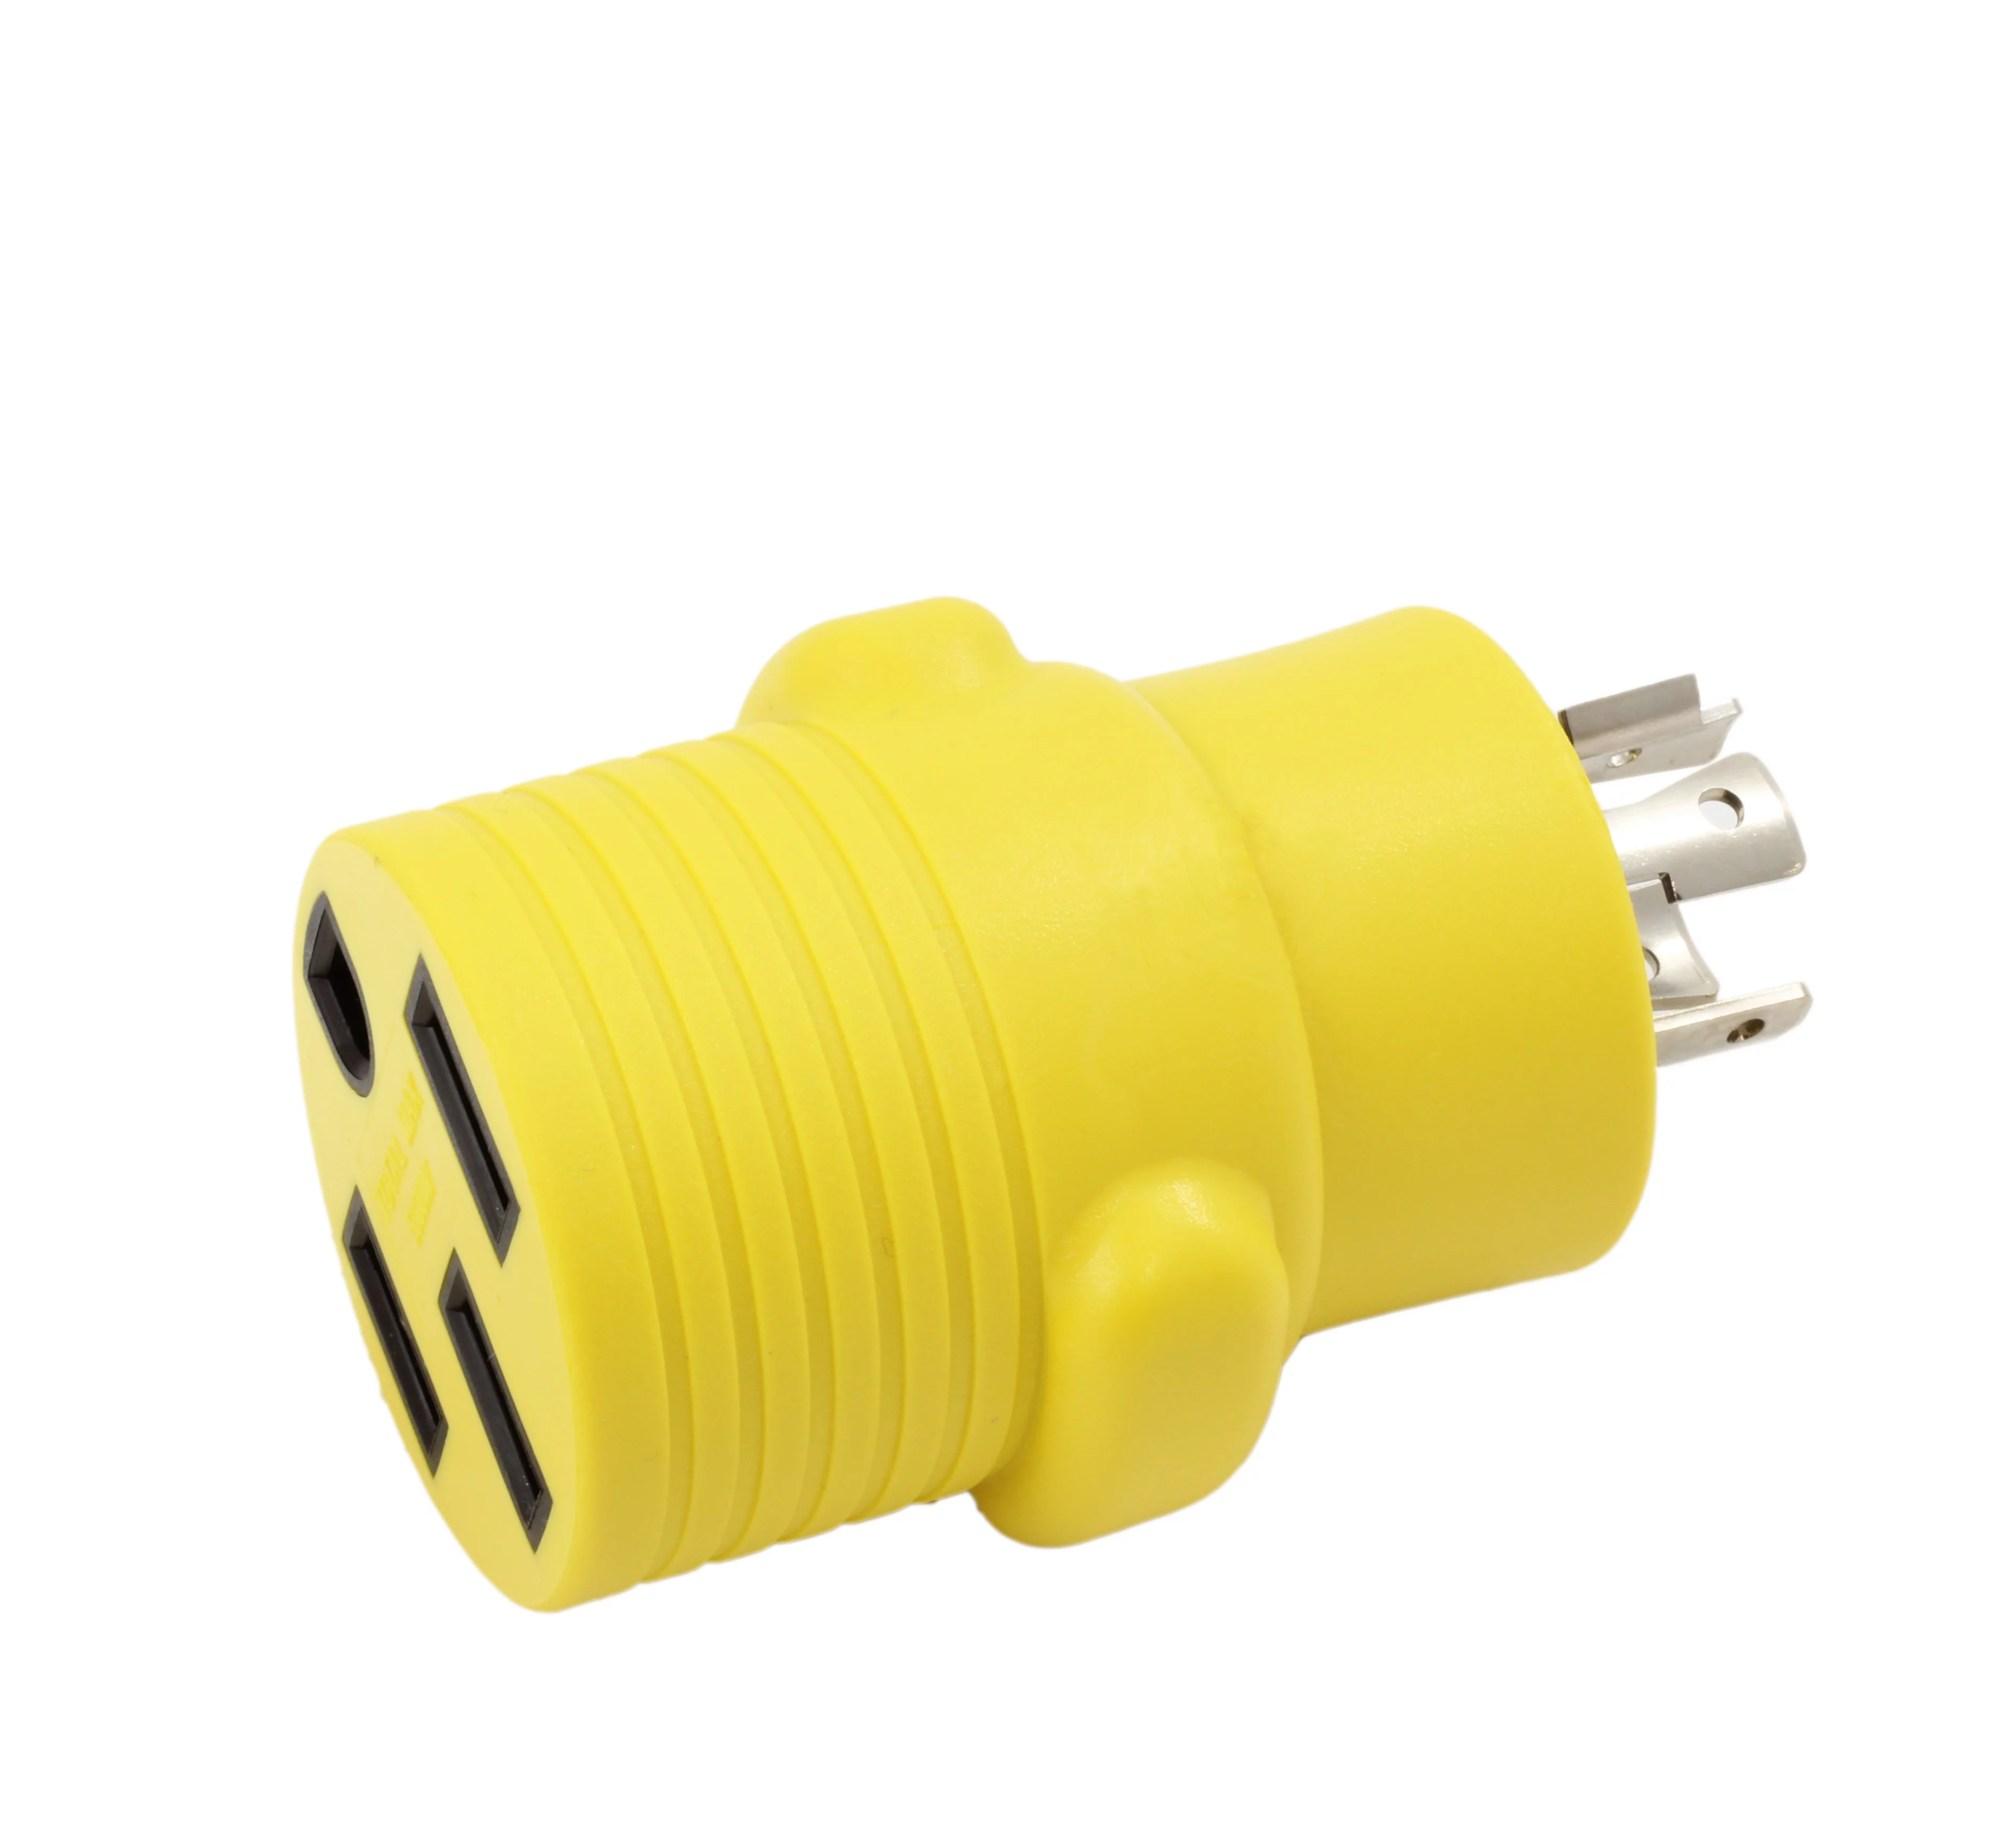 hight resolution of ac works rvl14201450 ev rv generator adapter nema l14 20p 20amp 4 prong generator locking plug to rv ev rande nema 14 50r 50amp 125 250volt female